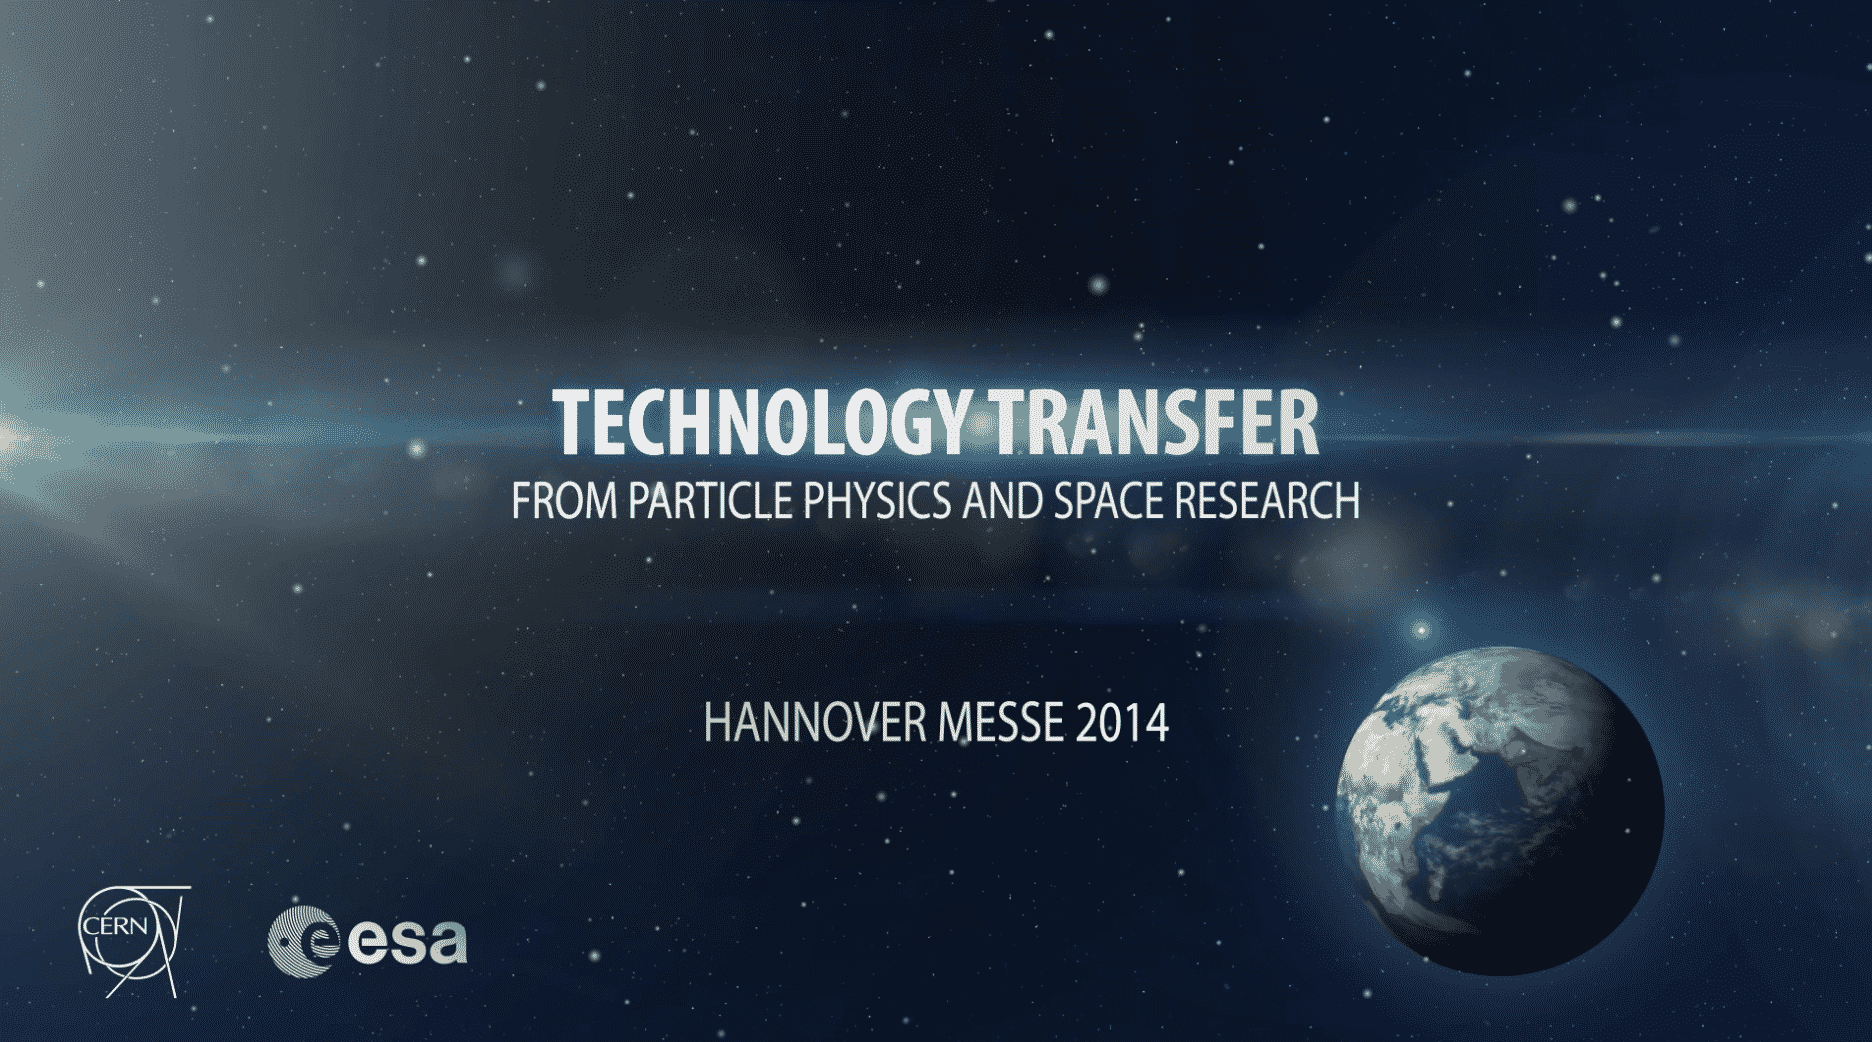 Messe-Video PR ESA CERN